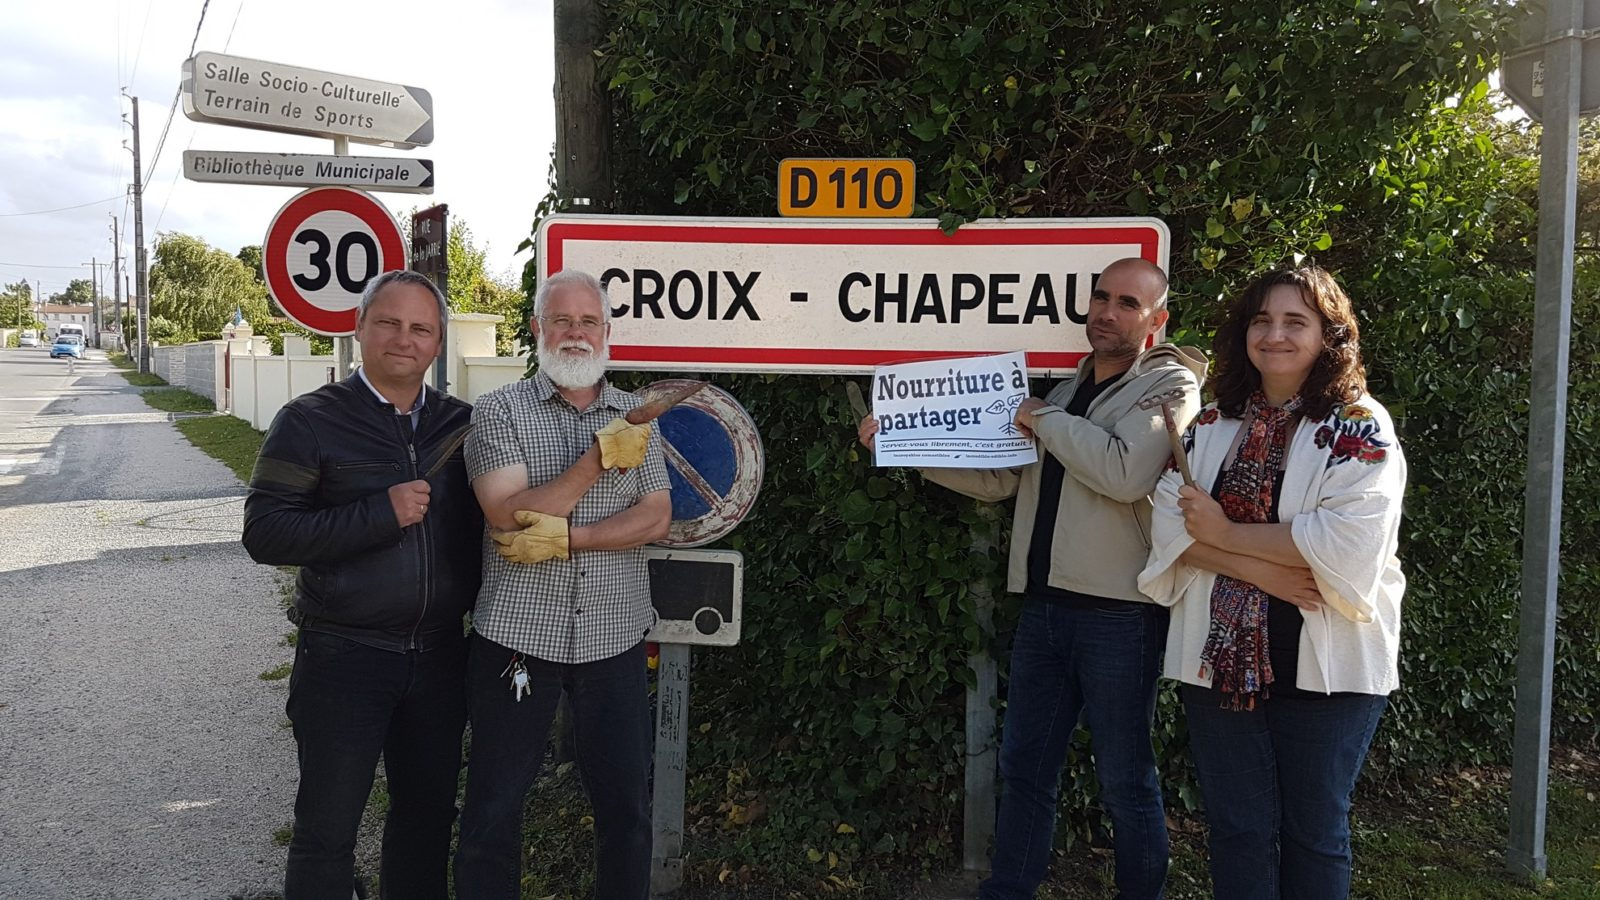 CROIX-CHAPEAU